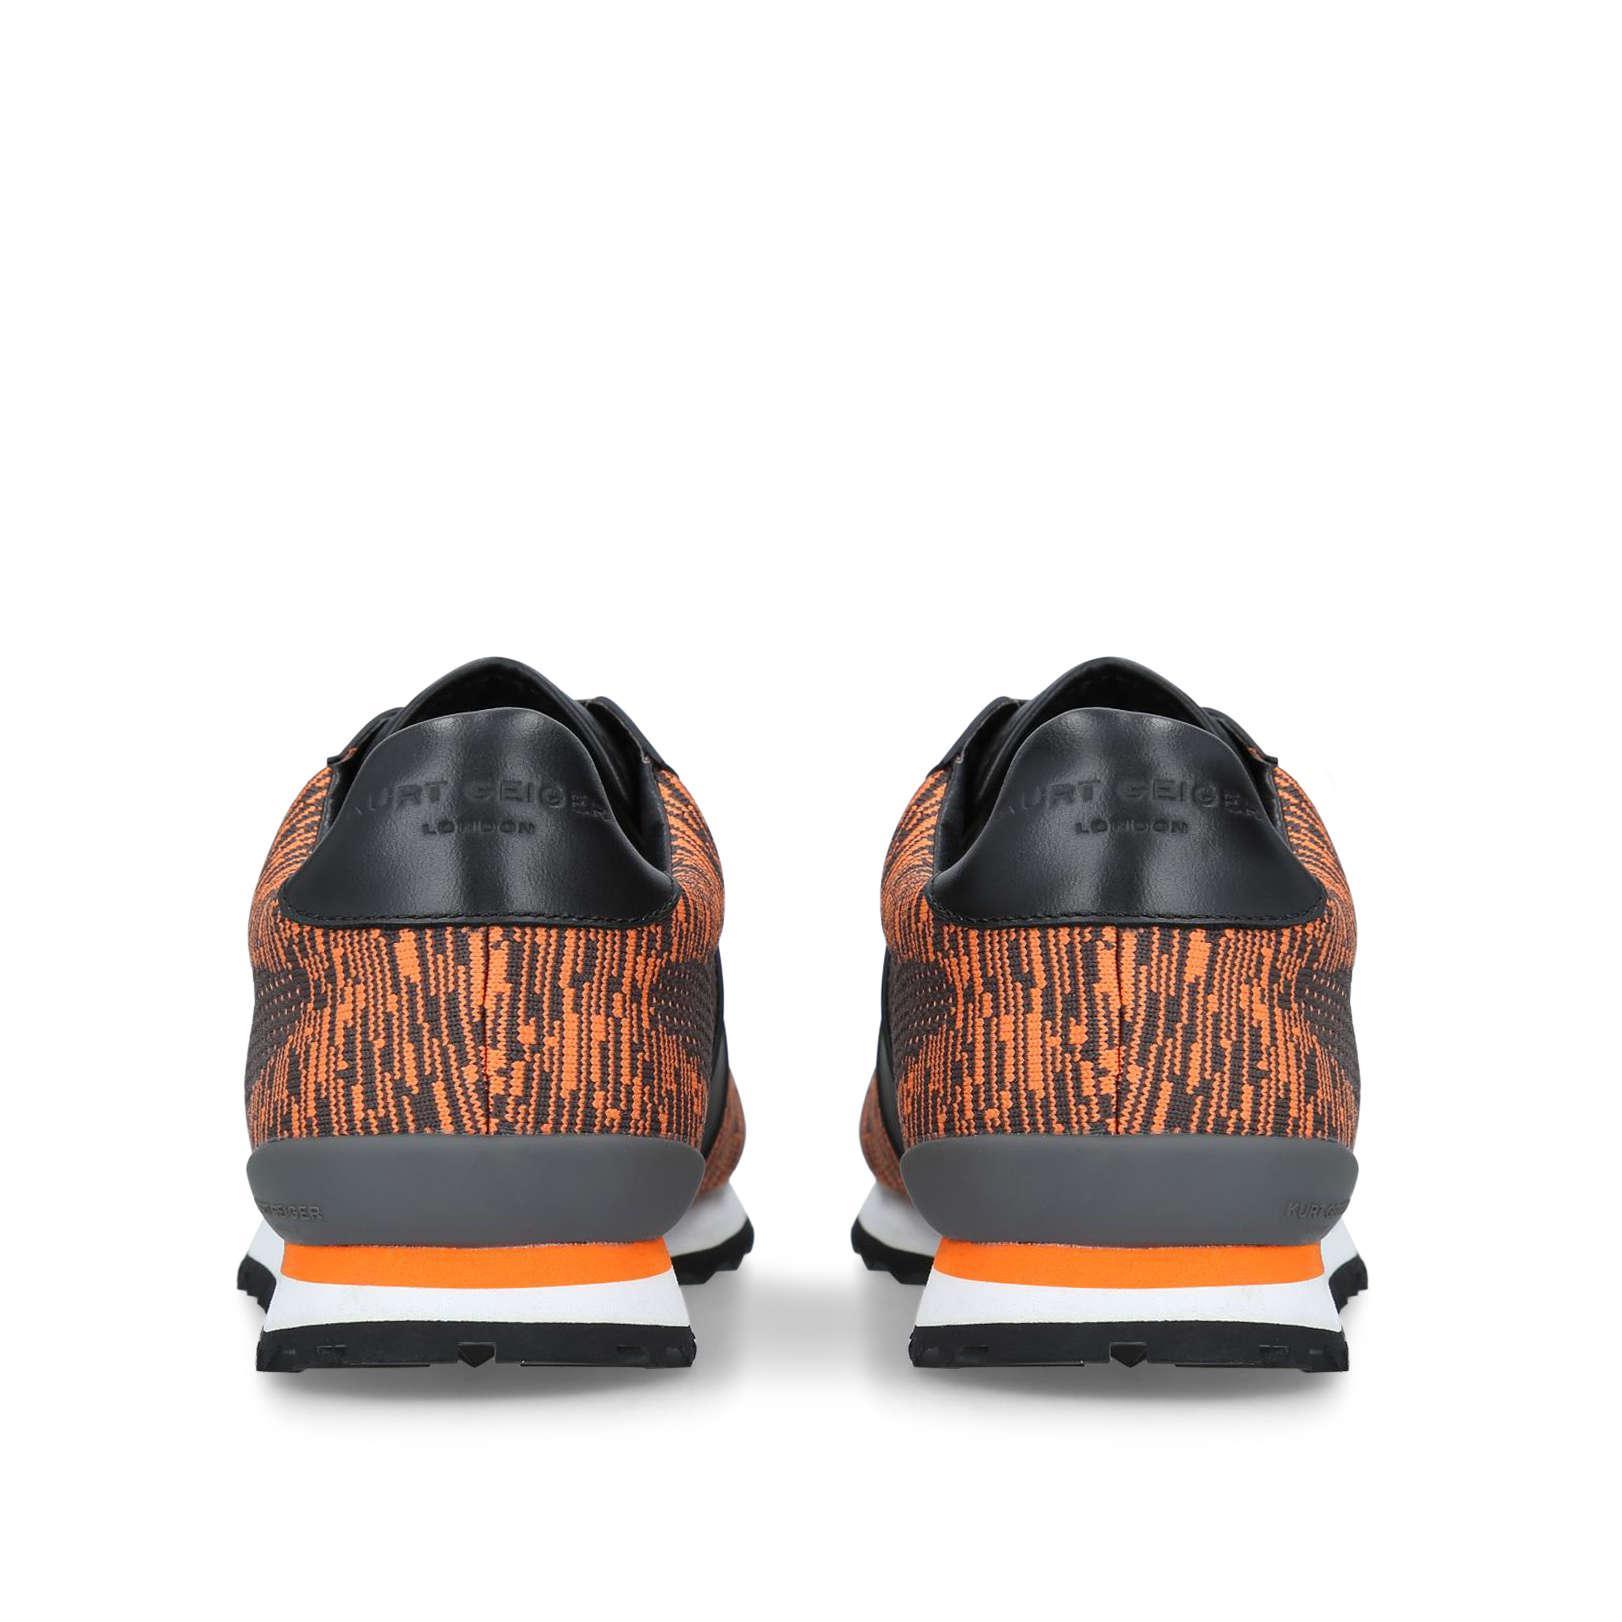 Kurt Geiger Denim Lamont Knit Sneakers